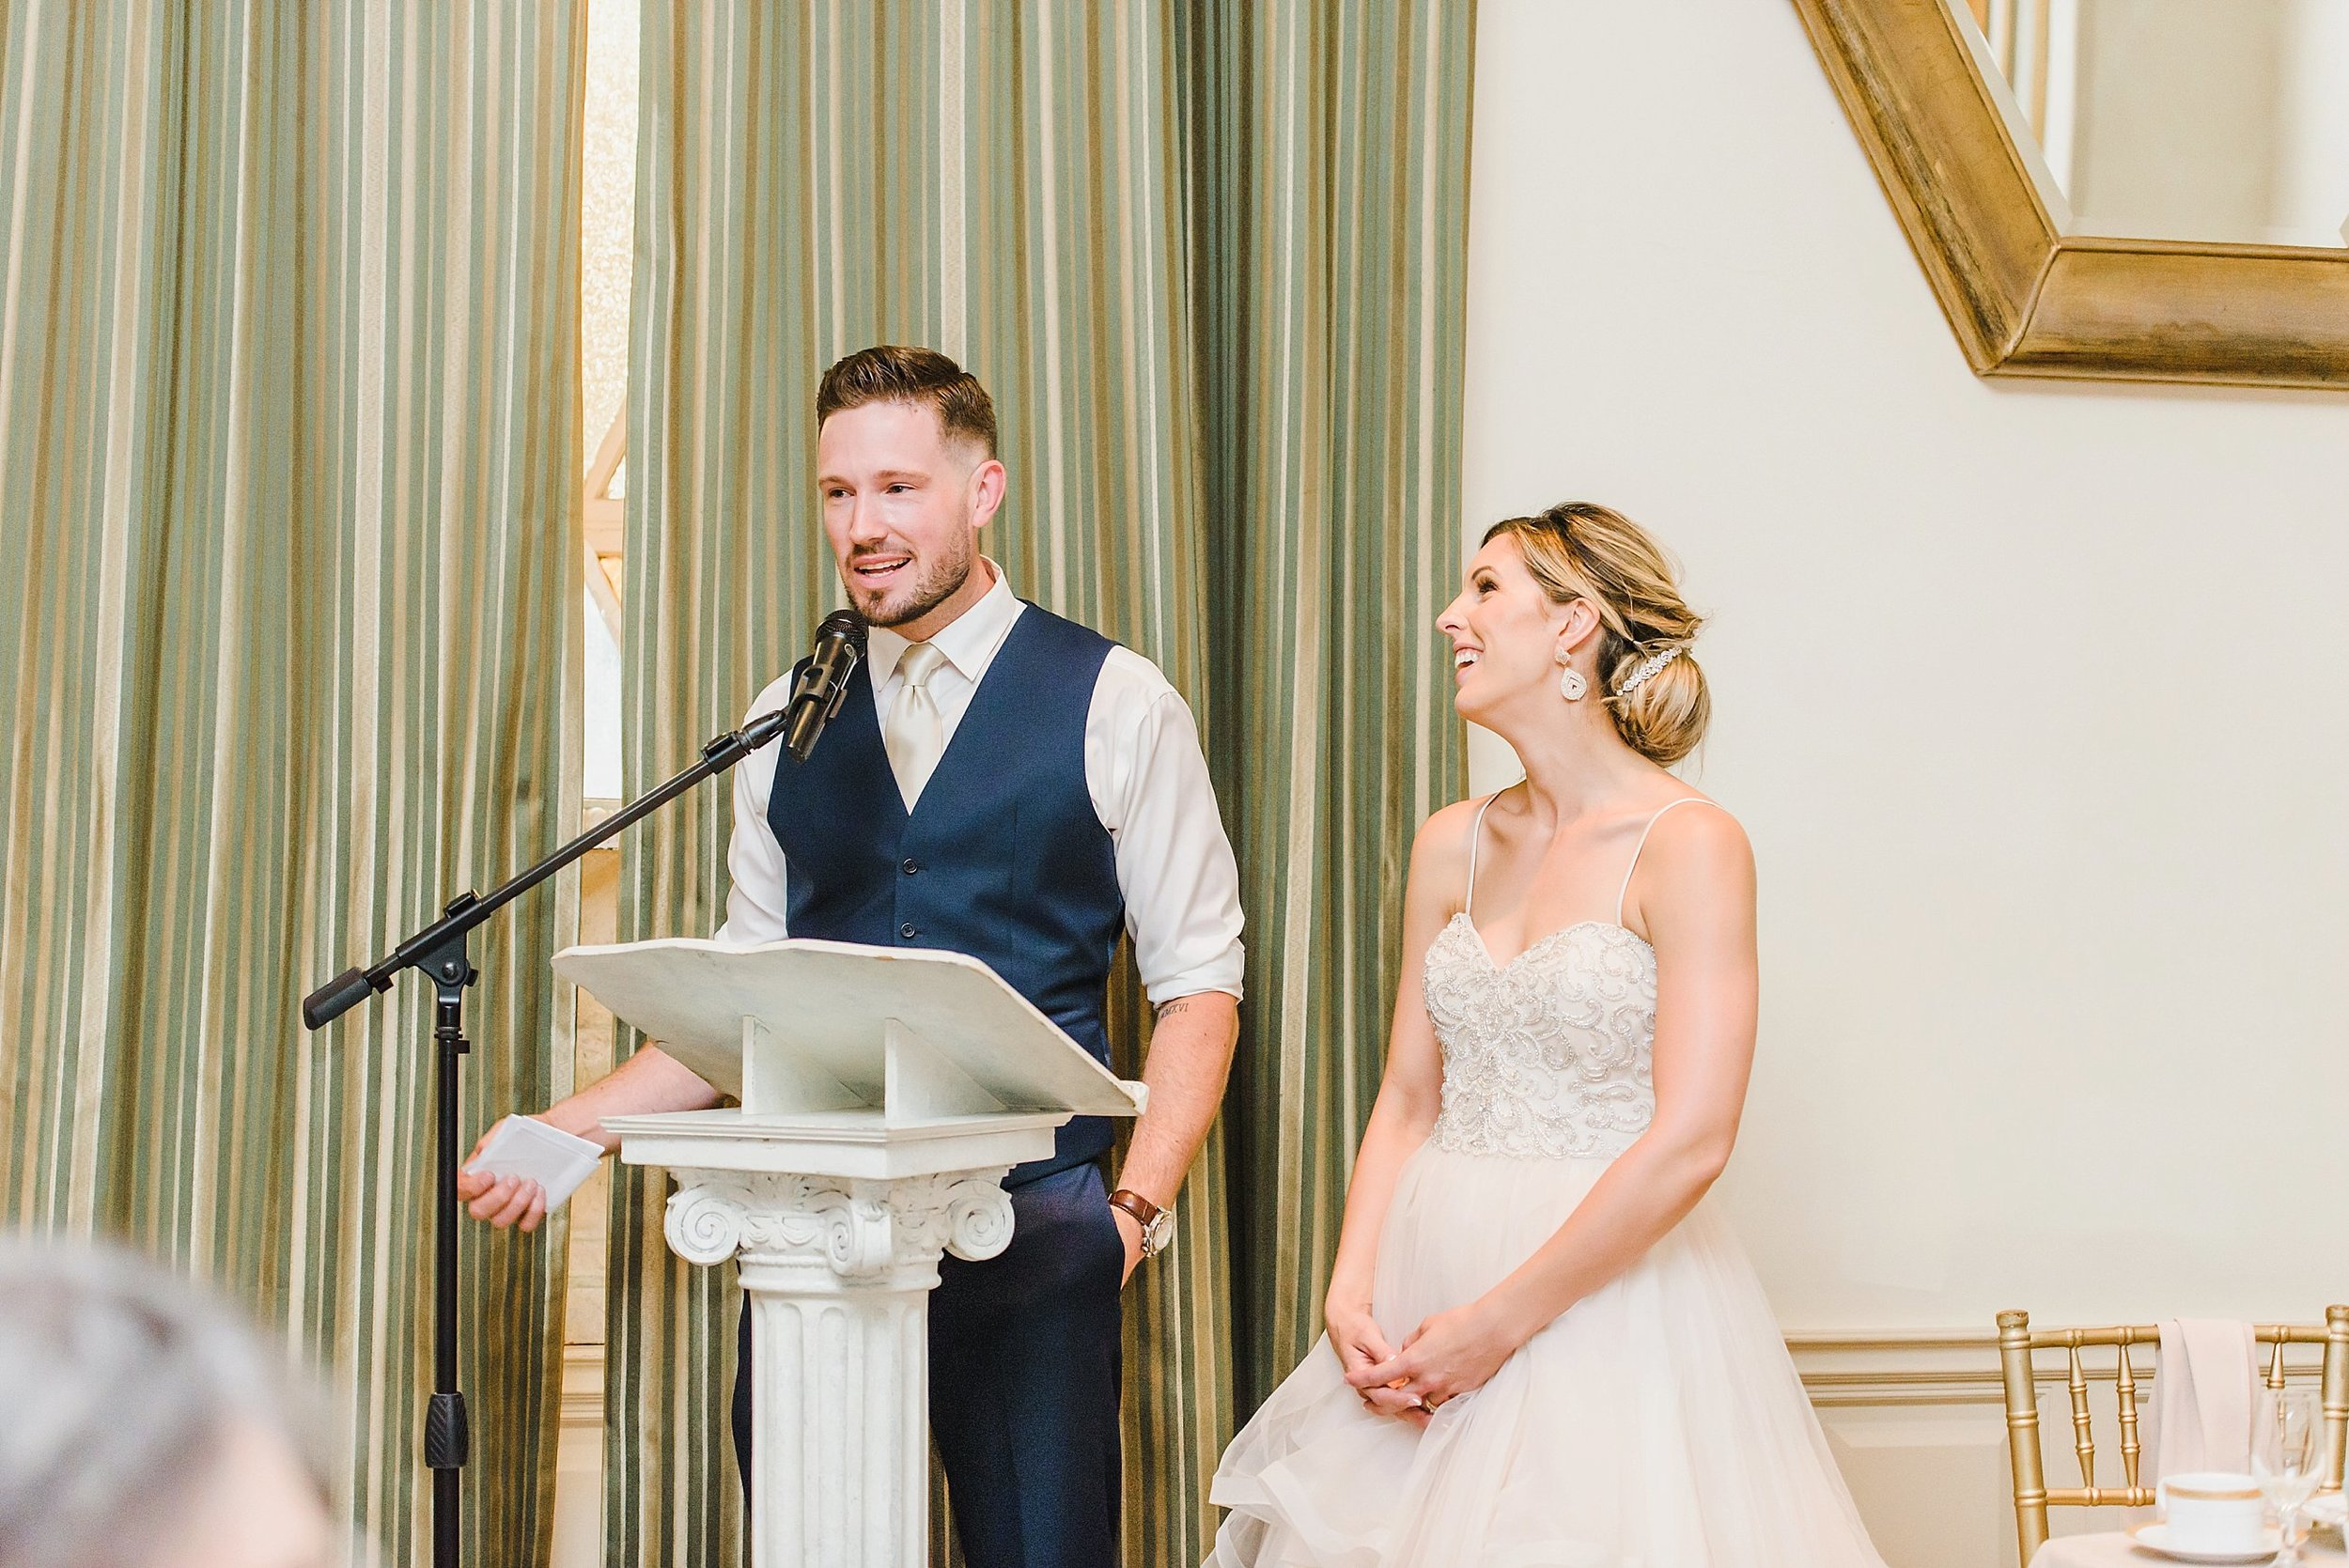 light airy indie fine art ottawa wedding photographer | Ali and Batoul Photography_0227.jpg